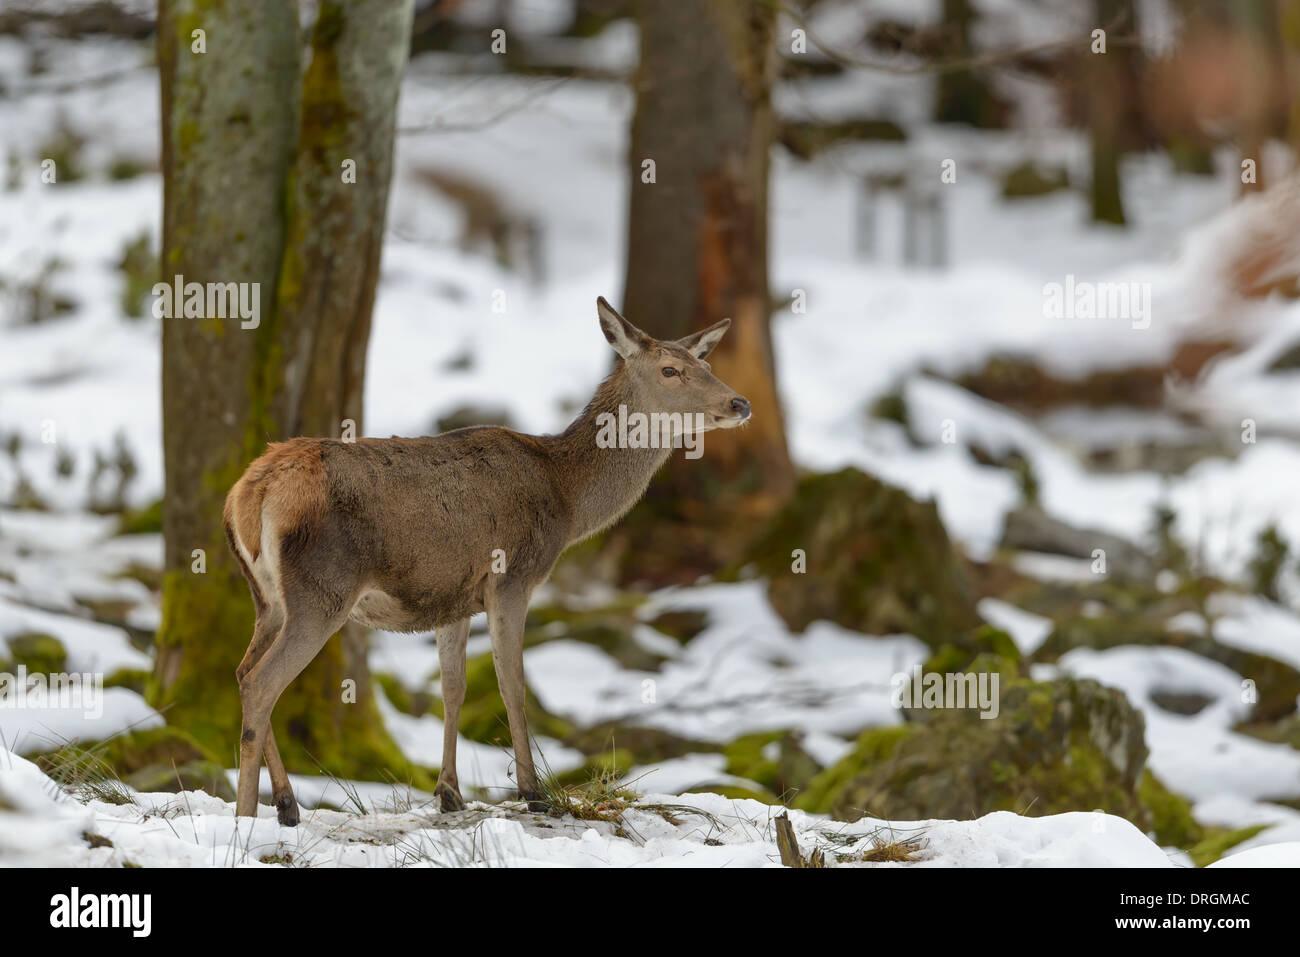 Hirschkuh Rothirsch, Cervus elaphus, female red deer Stock Photo